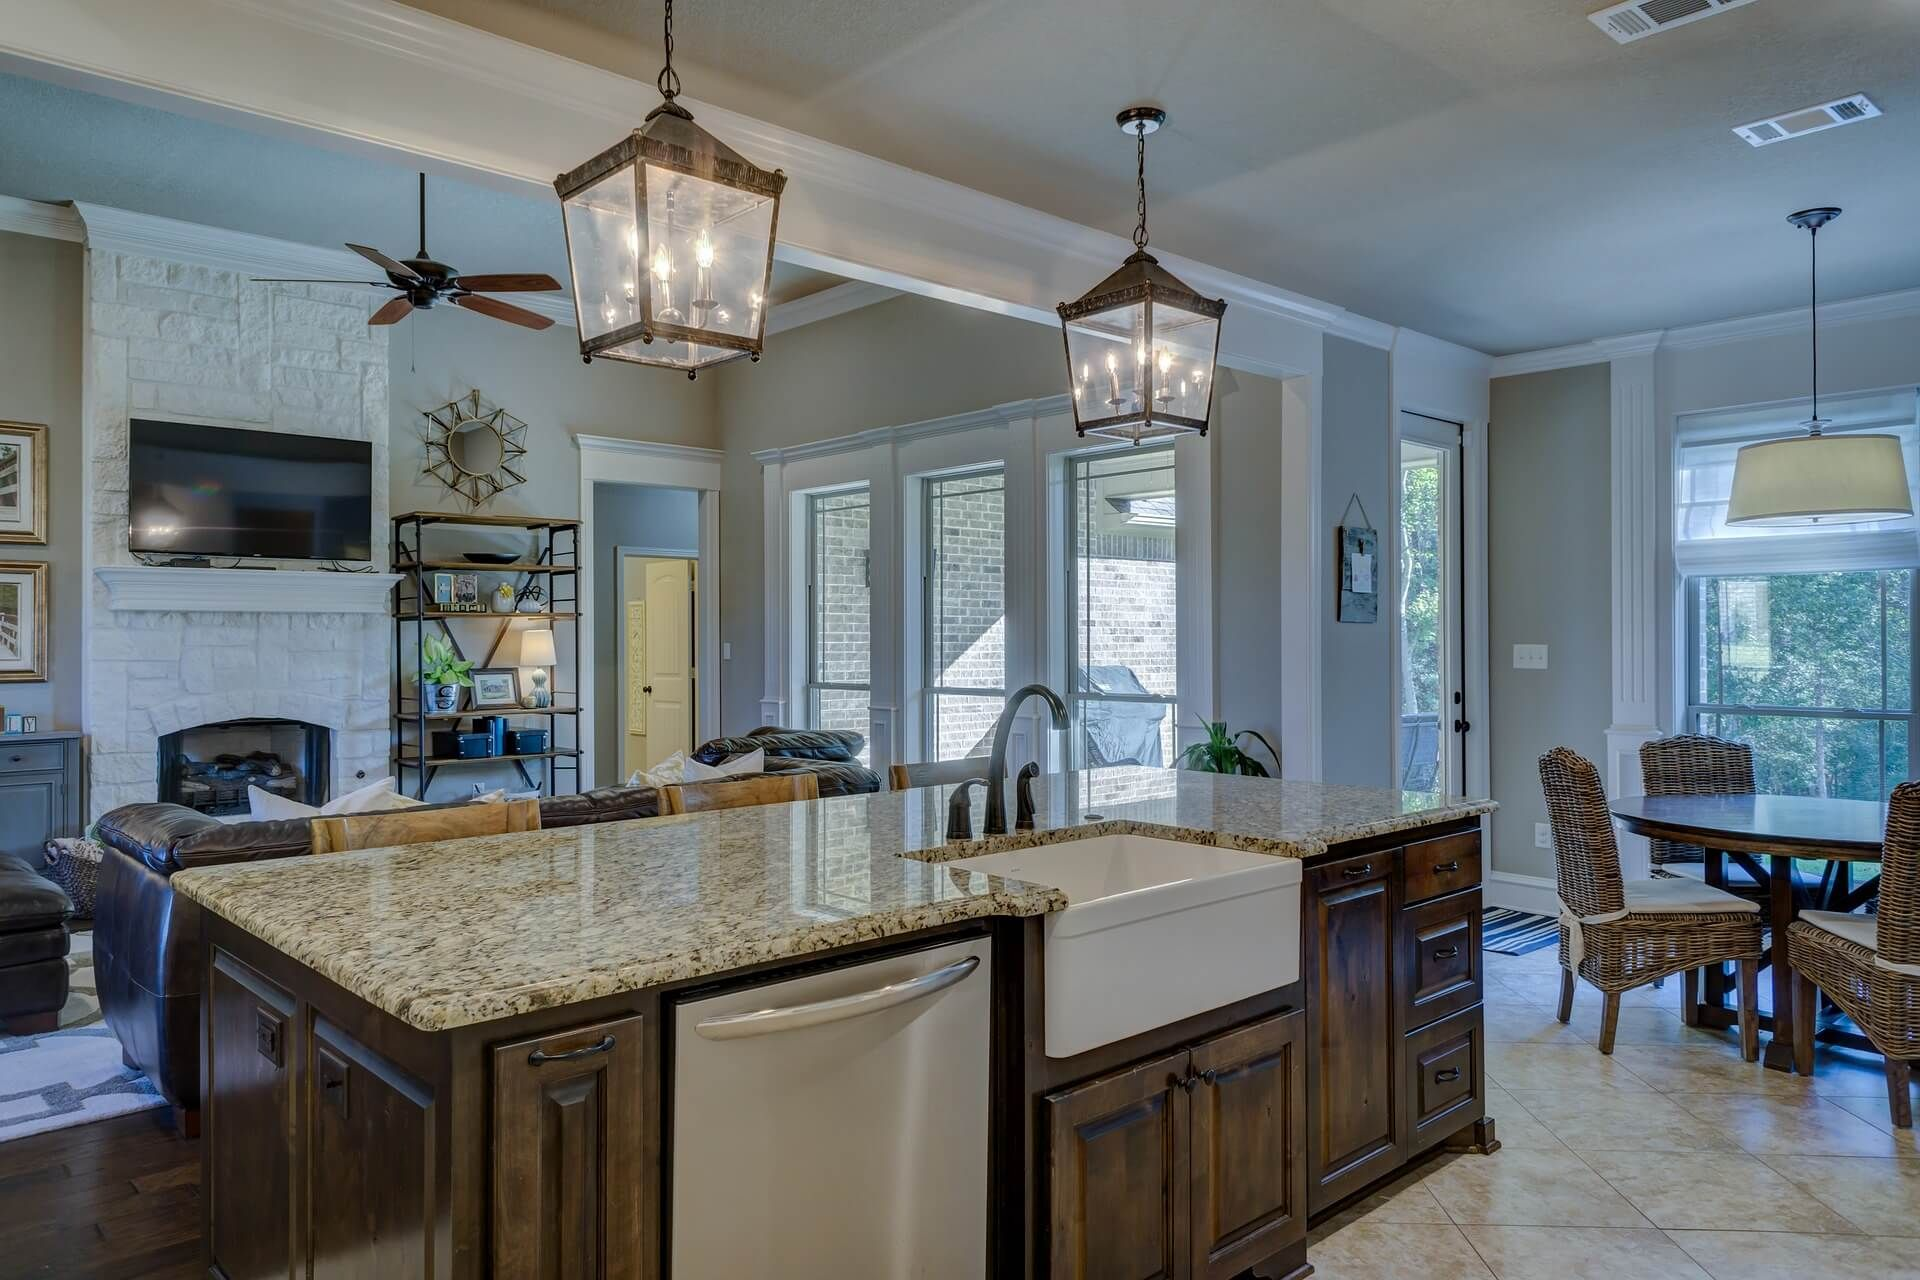 Top Tips To Maintain Your Stone Countertops Interior Design, Design